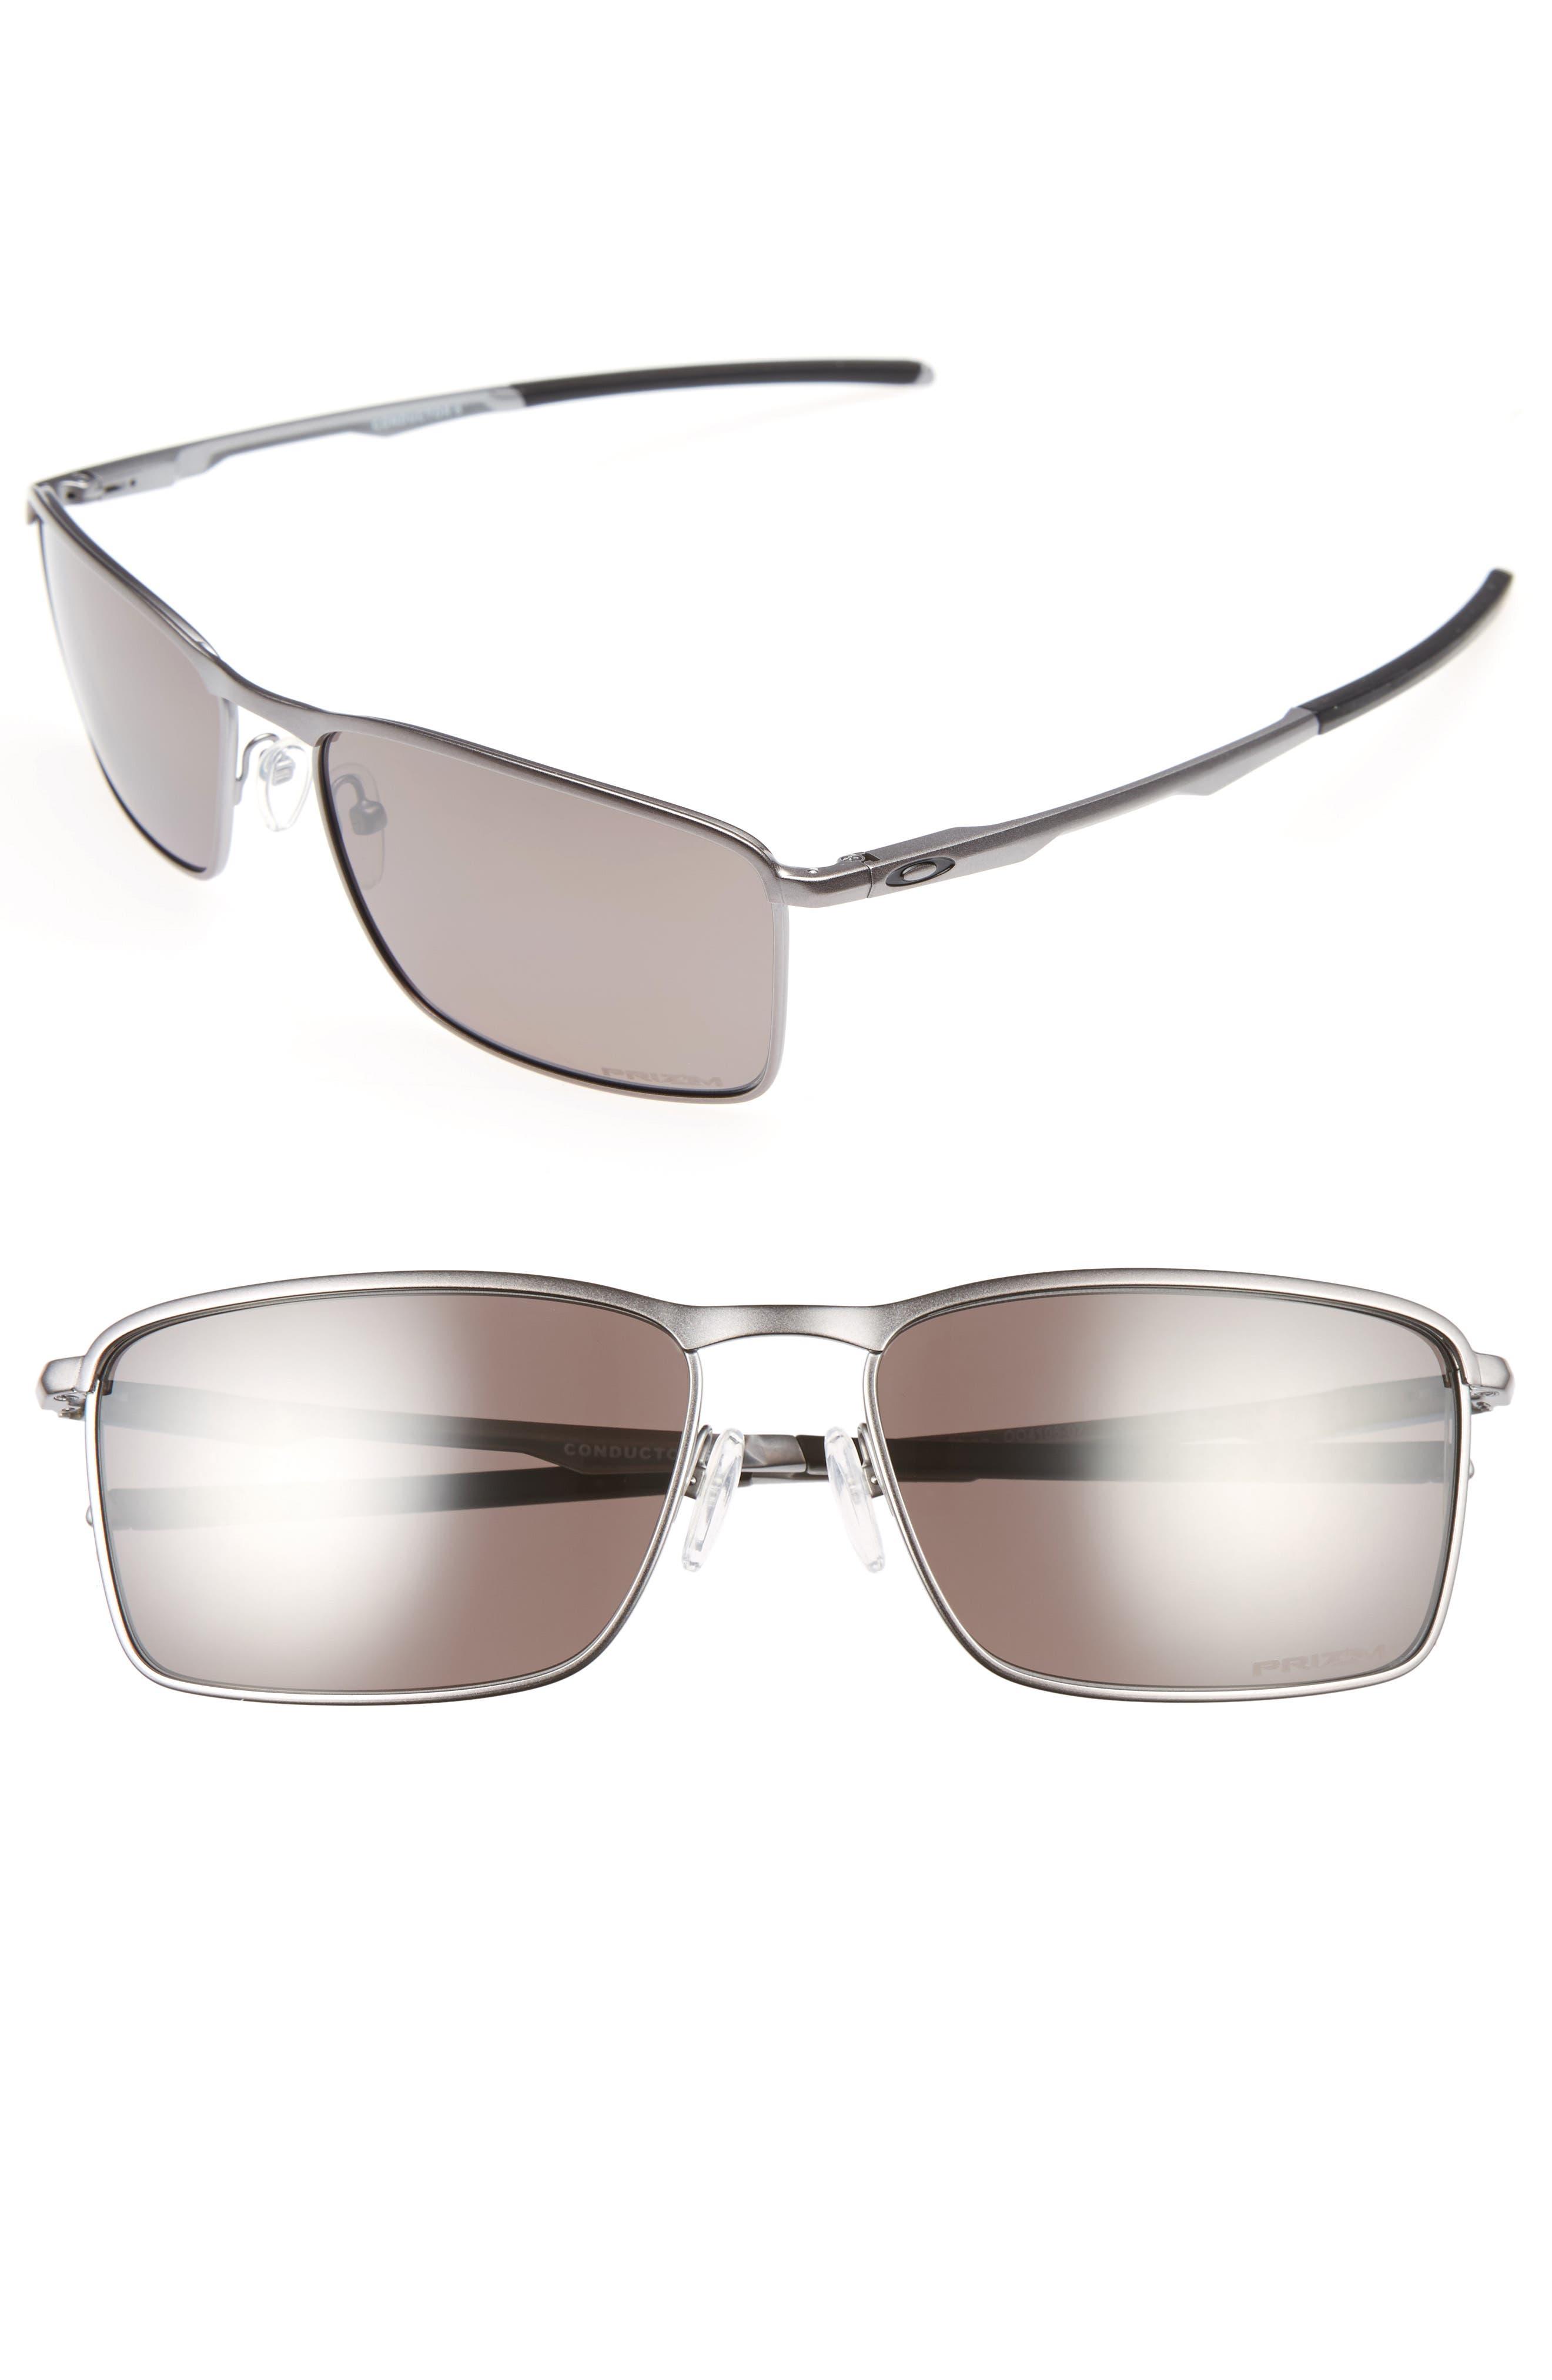 Conductor 6 58mm Polarized Sunglasses,                             Main thumbnail 1, color,                             GREY